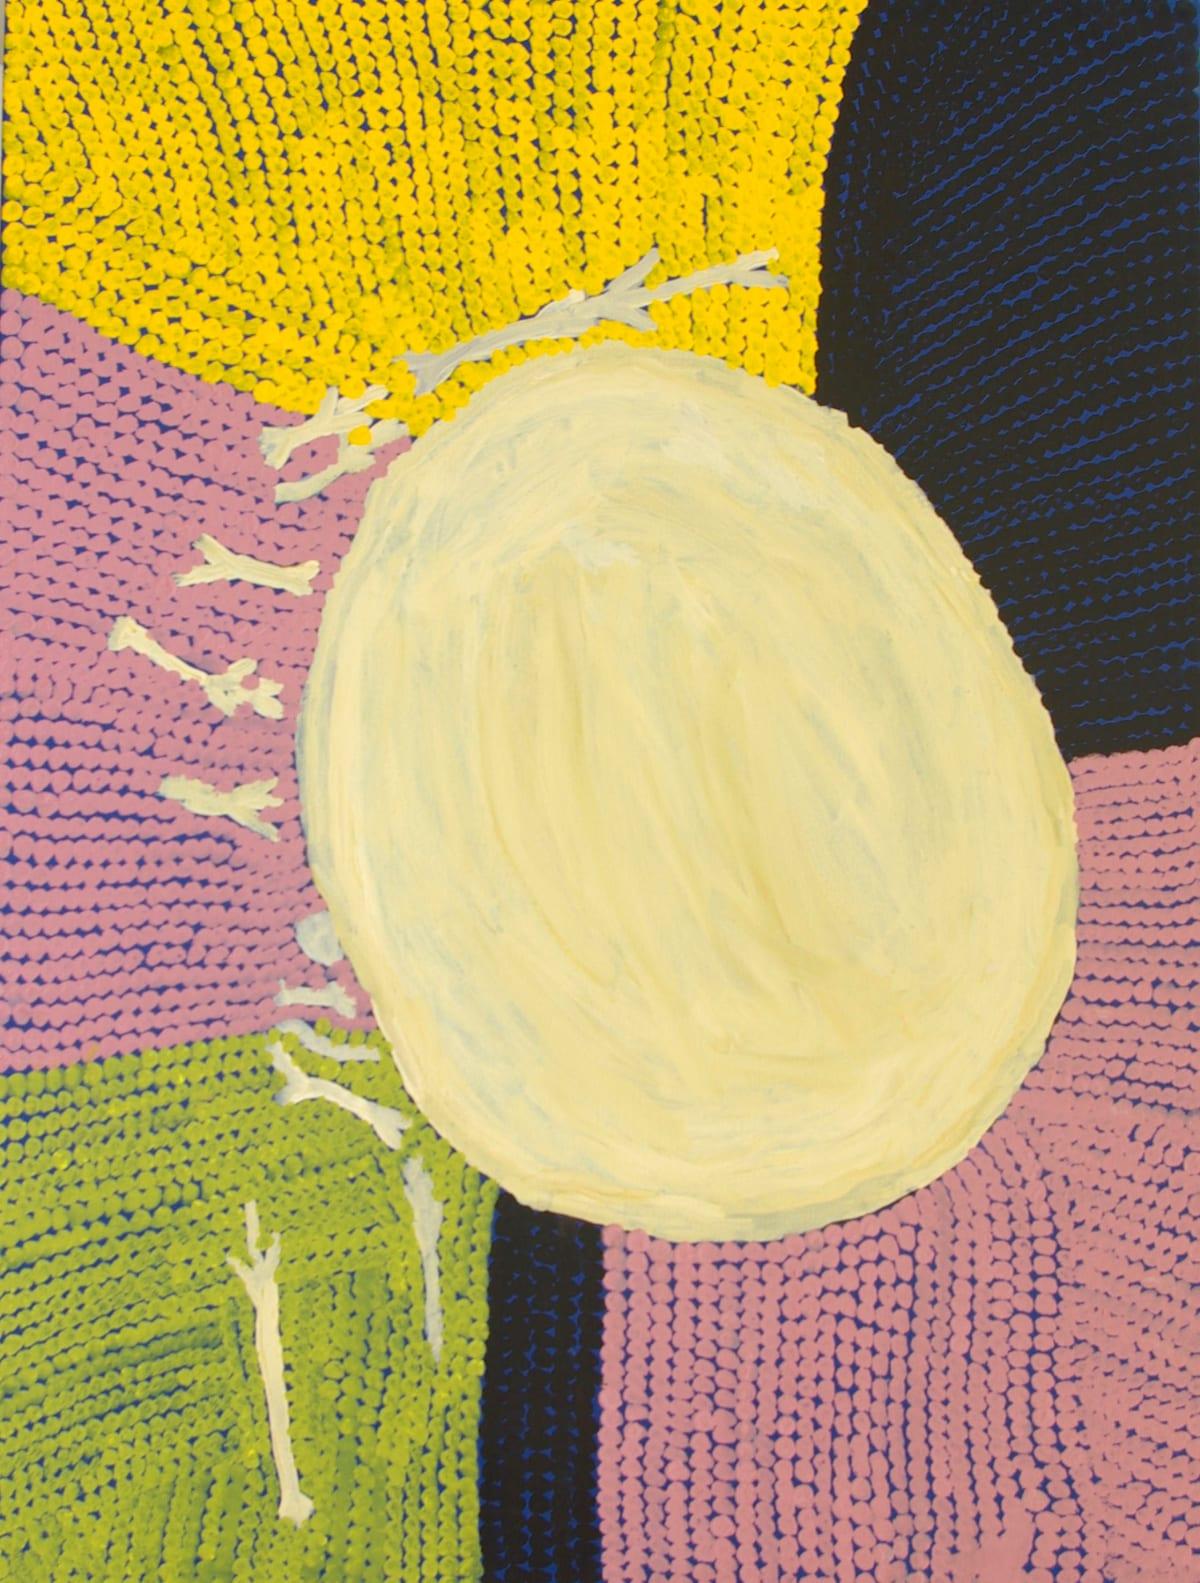 Tommy May (Ngarralja) Kurtal acrylic on canvas 90 x 120 cm